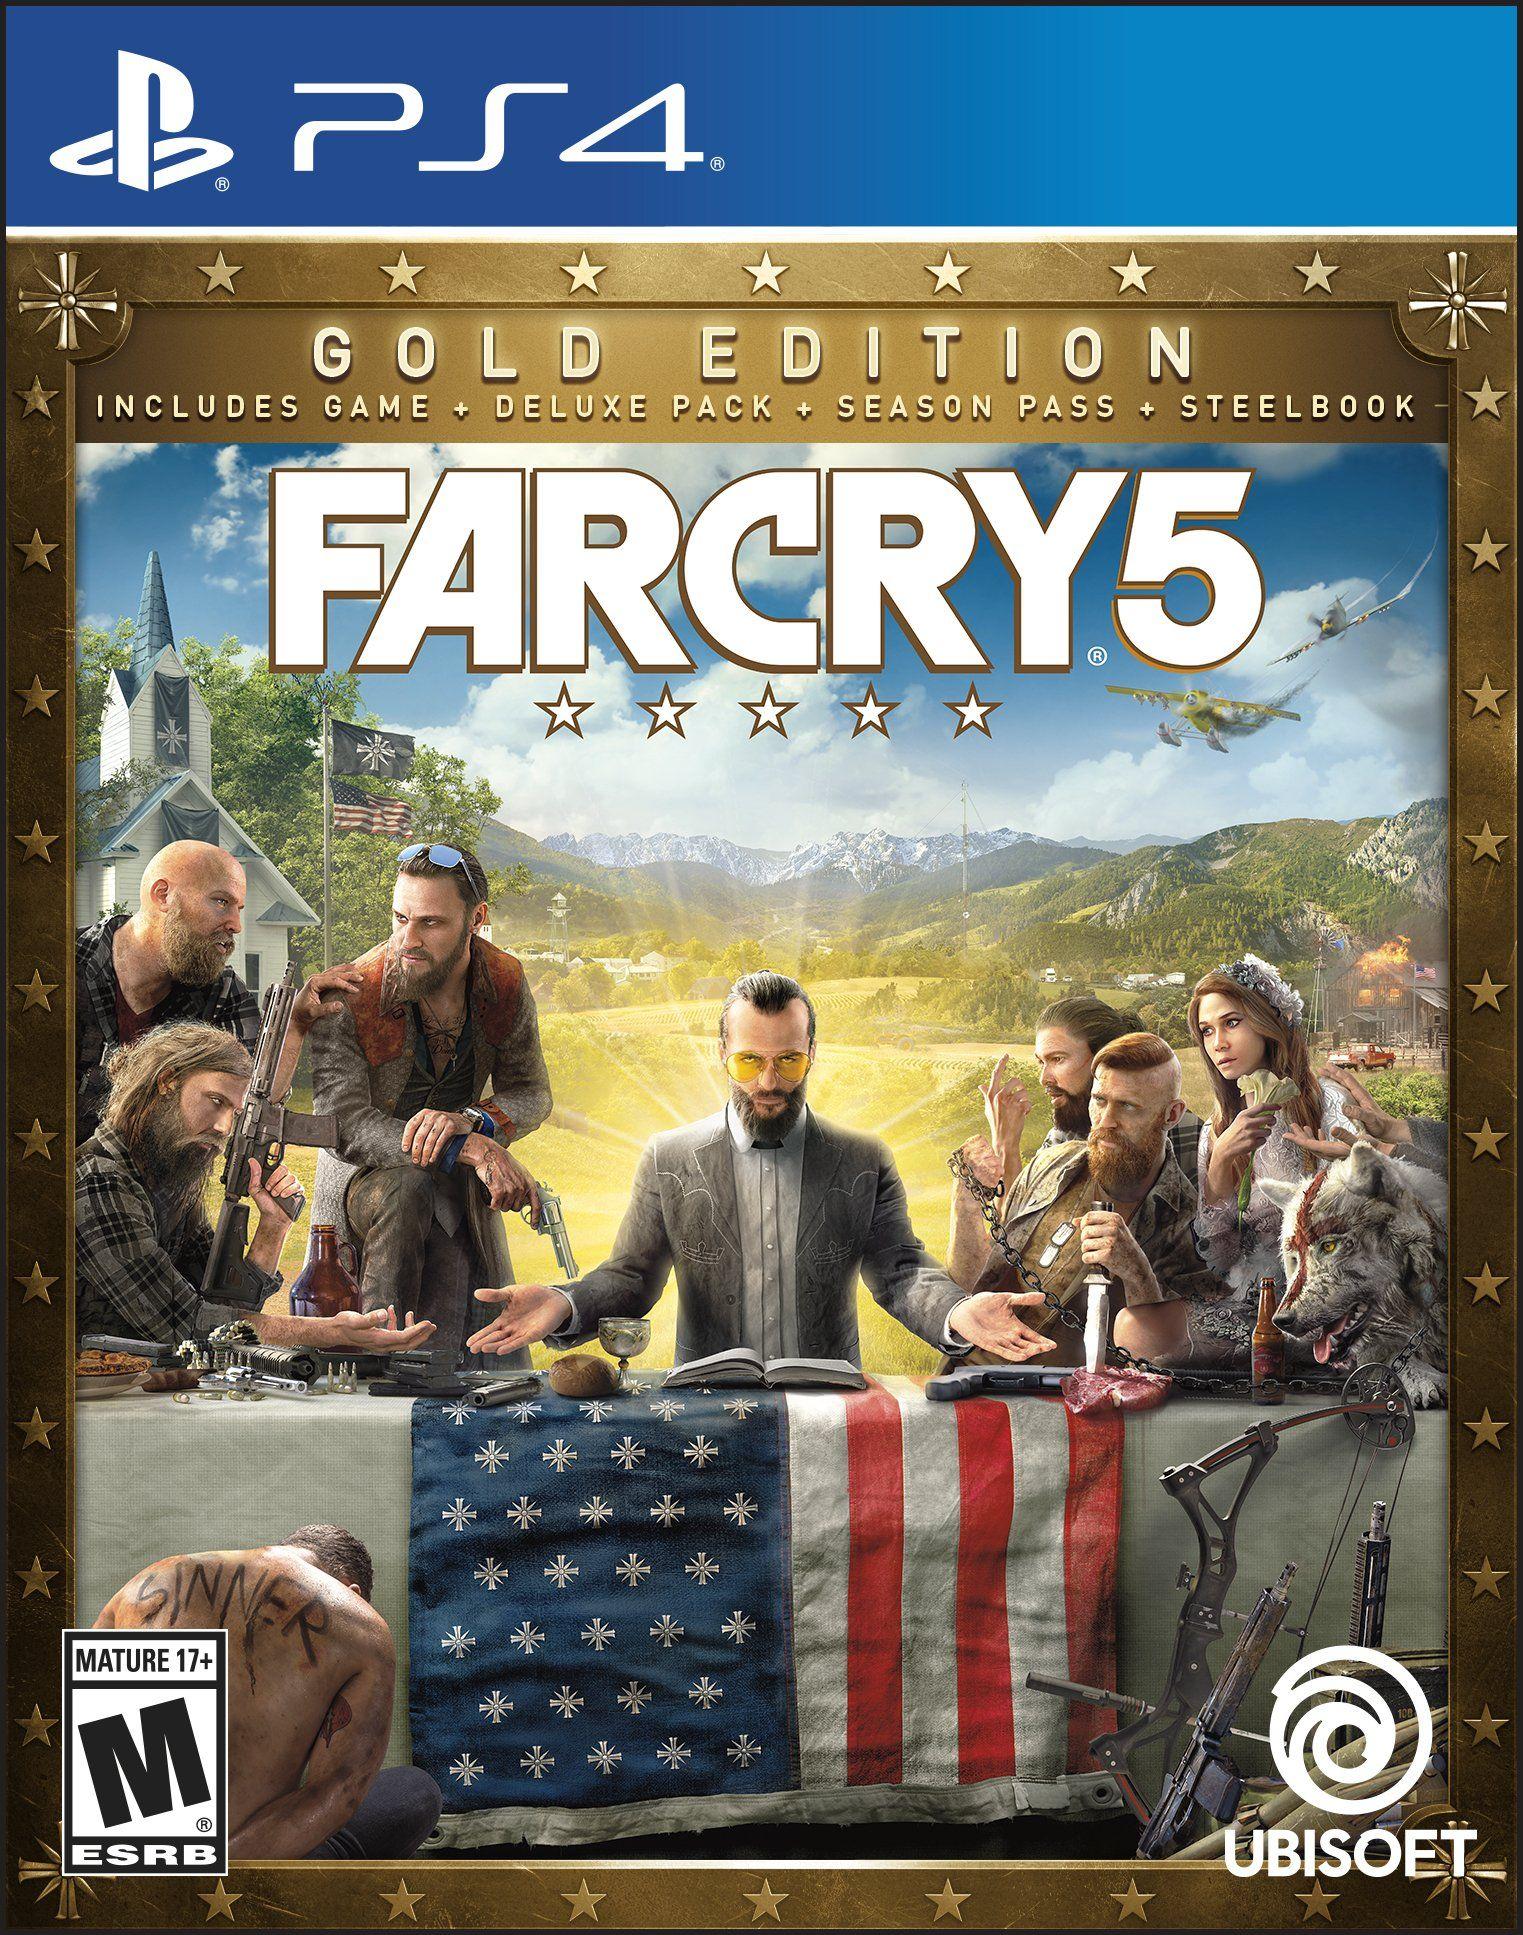 Far Cry 5 Steelbook Gold Edition Mi Psp 4 Pinterest Juegos